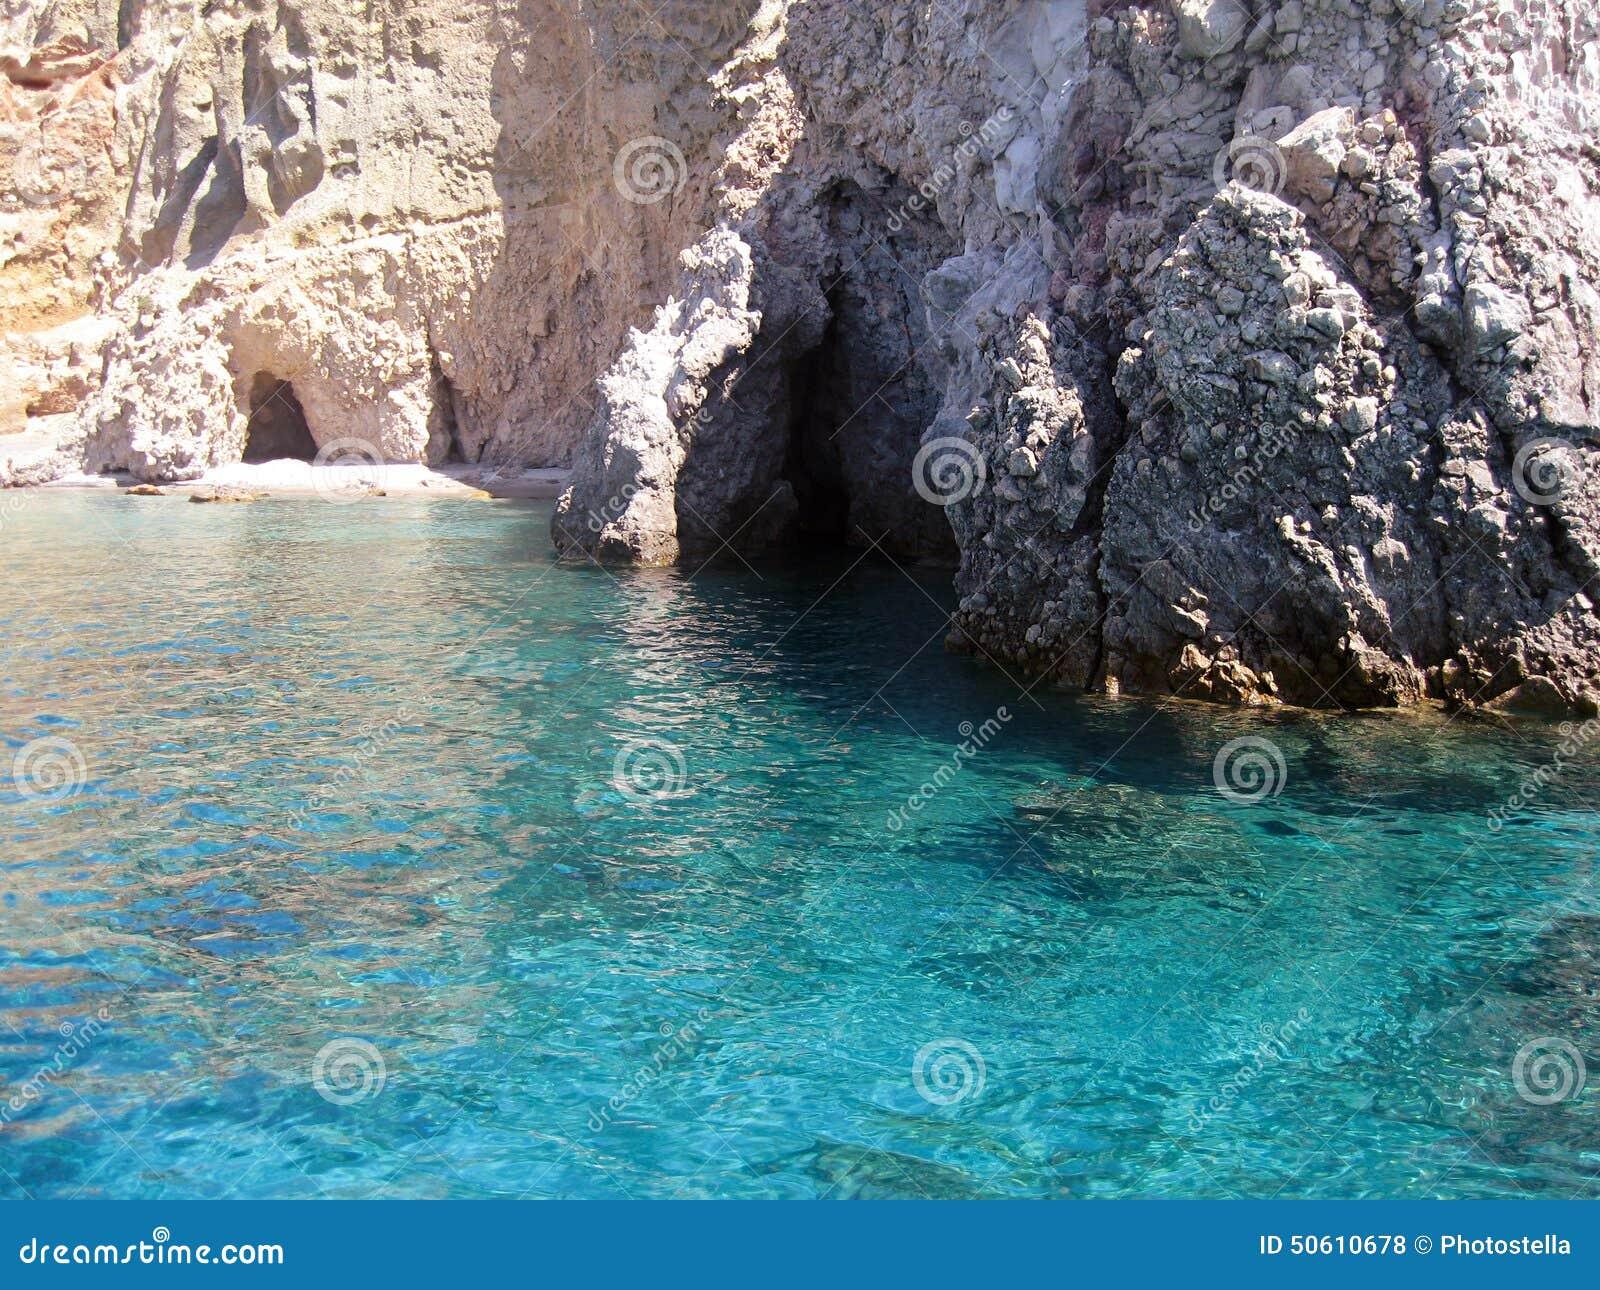 Kleftiko Beach, Milos Island Stock Photo - Image: 50610678